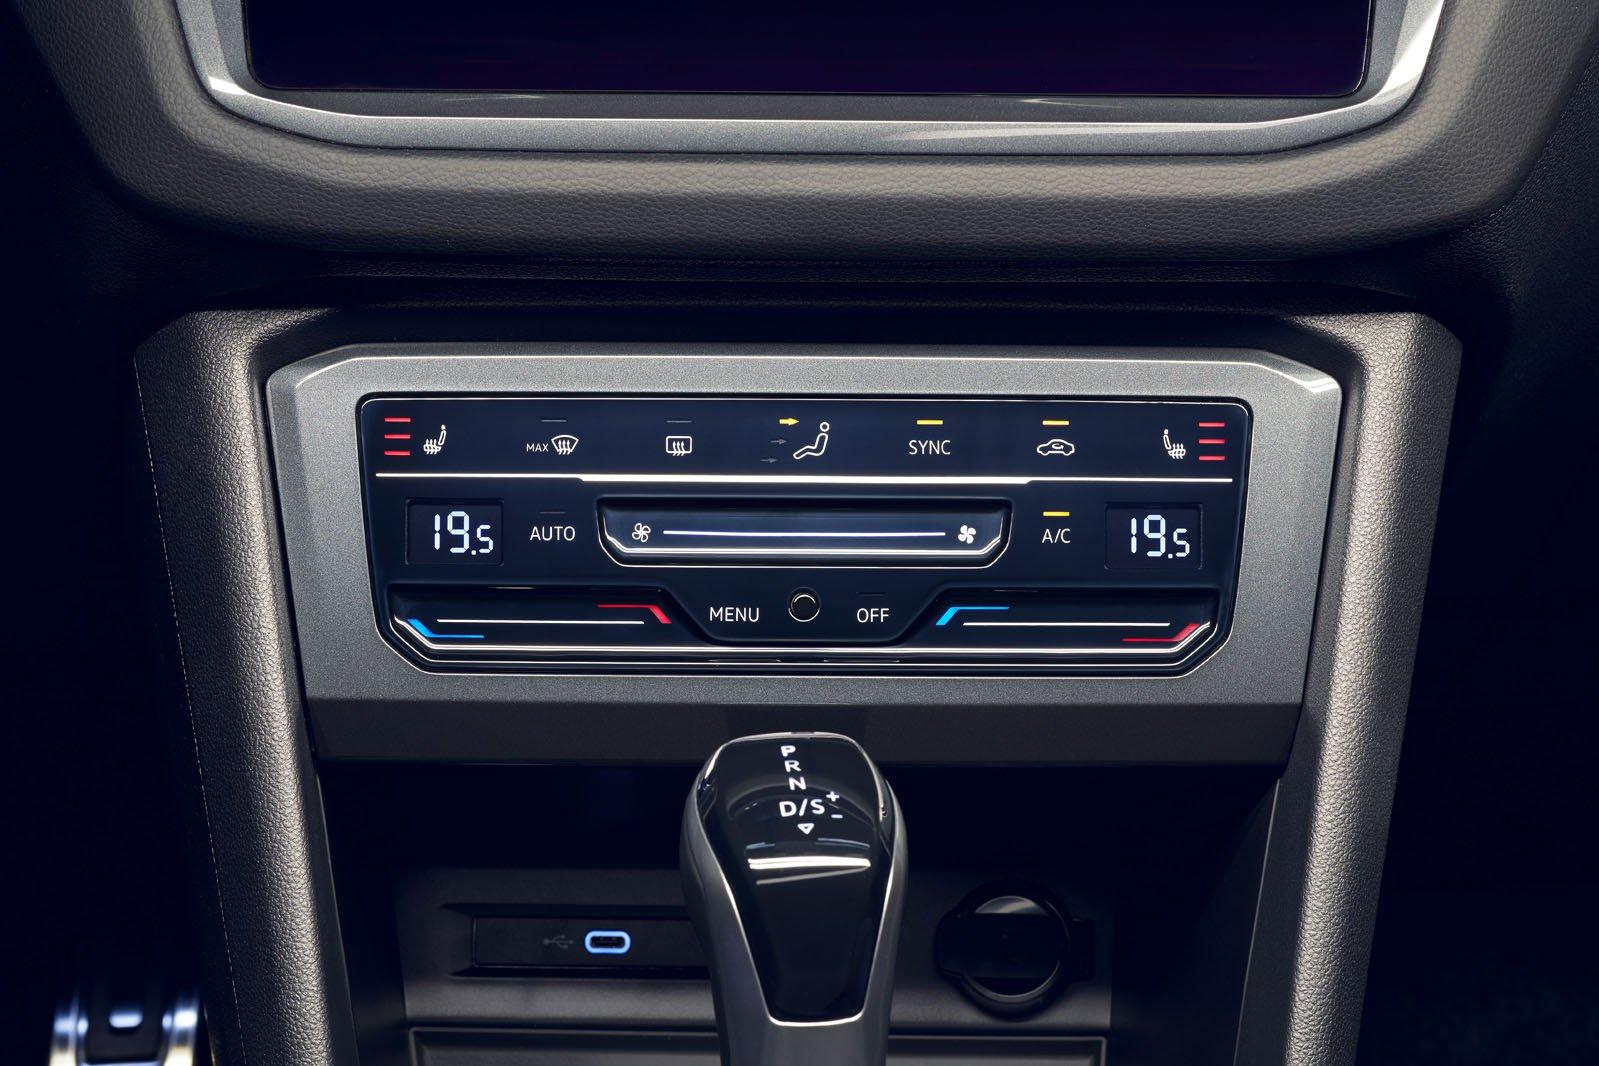 2021 Volkswagen Tiguan centre console